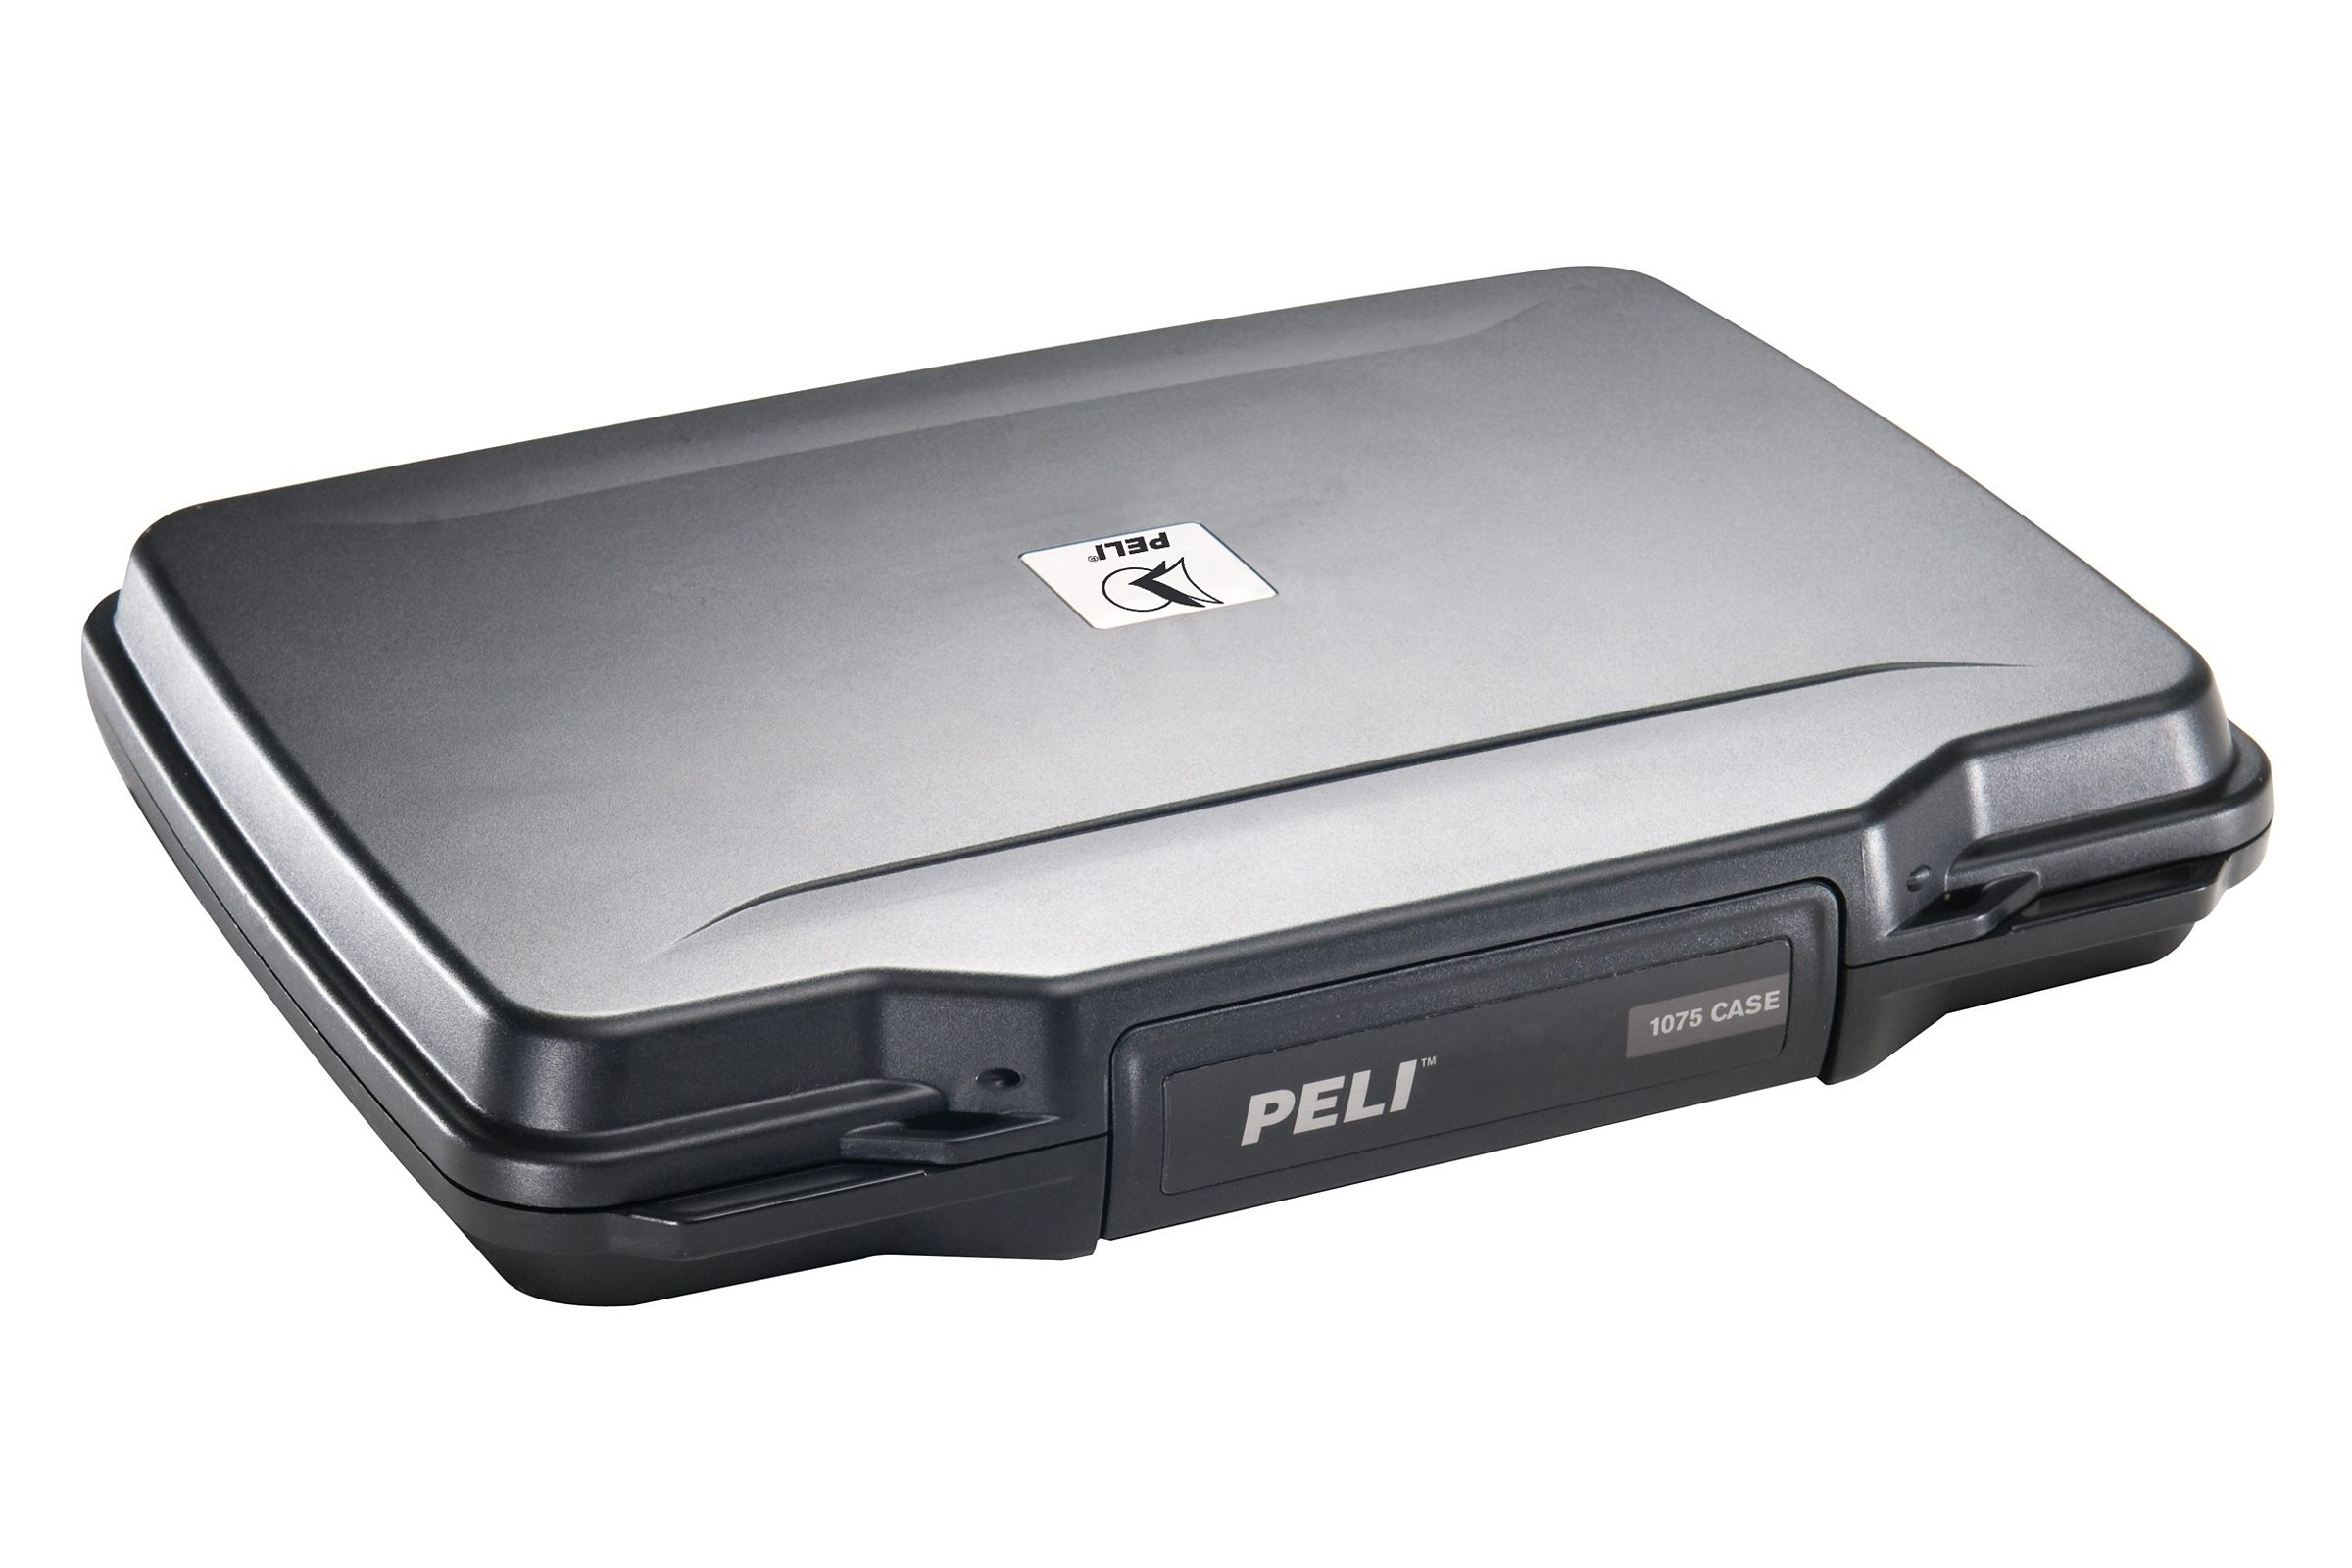 Peli Campingtruhe & -Kiste »ProGear 1075 Hardback Case mit Schaumeinsatz«